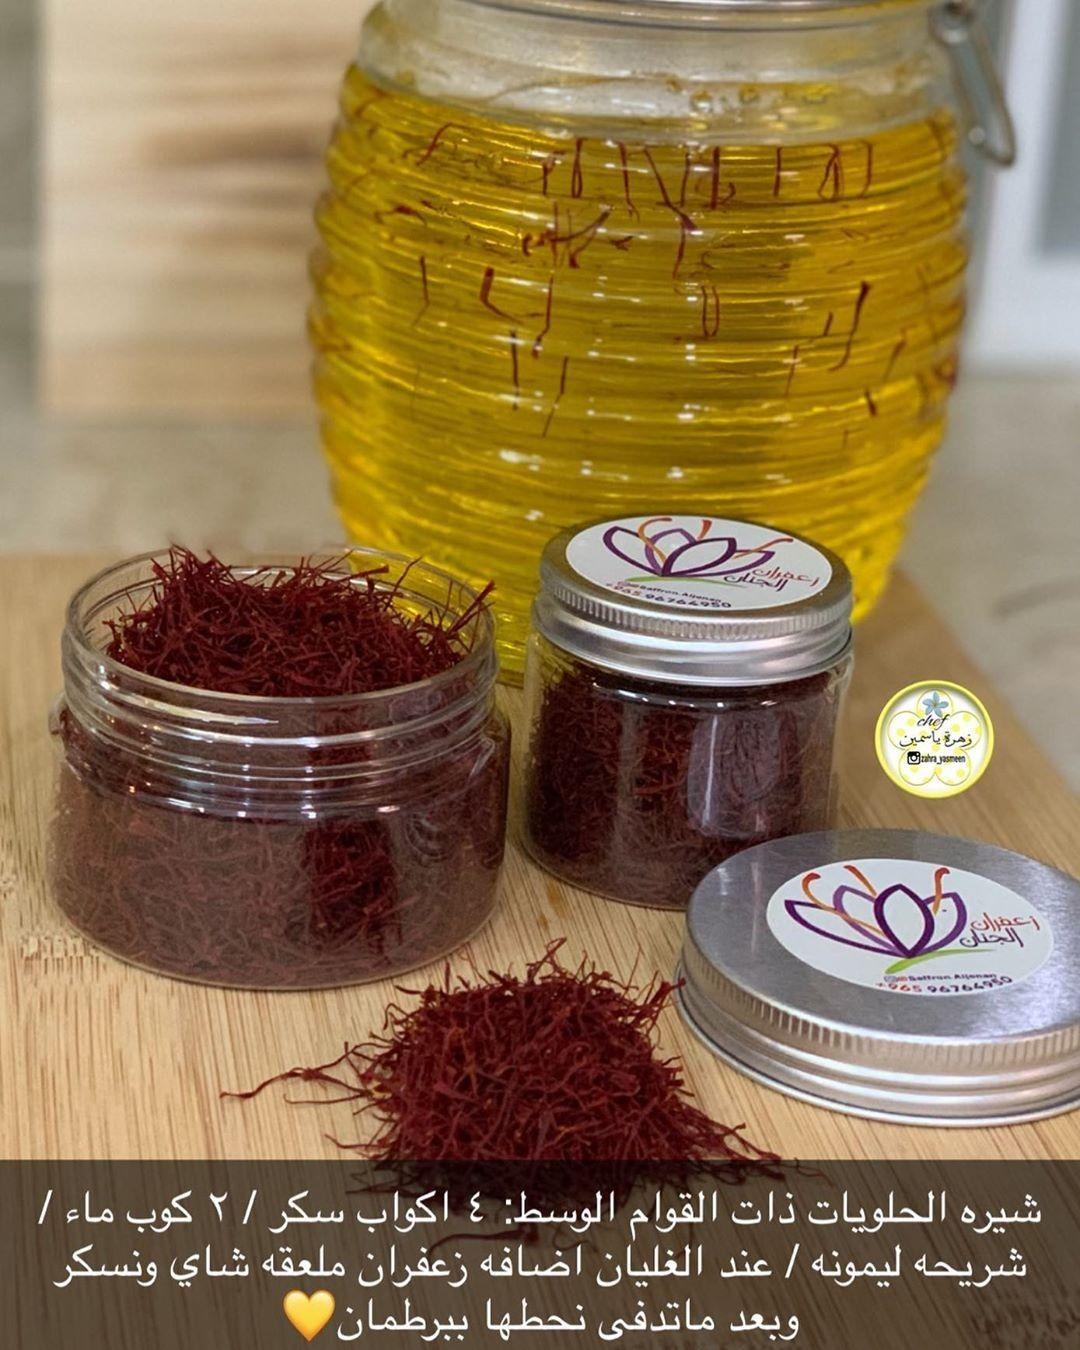 Pin By Dodi On وصفات من كل بلدان العربية Arabic Food Cooking Recipes Food